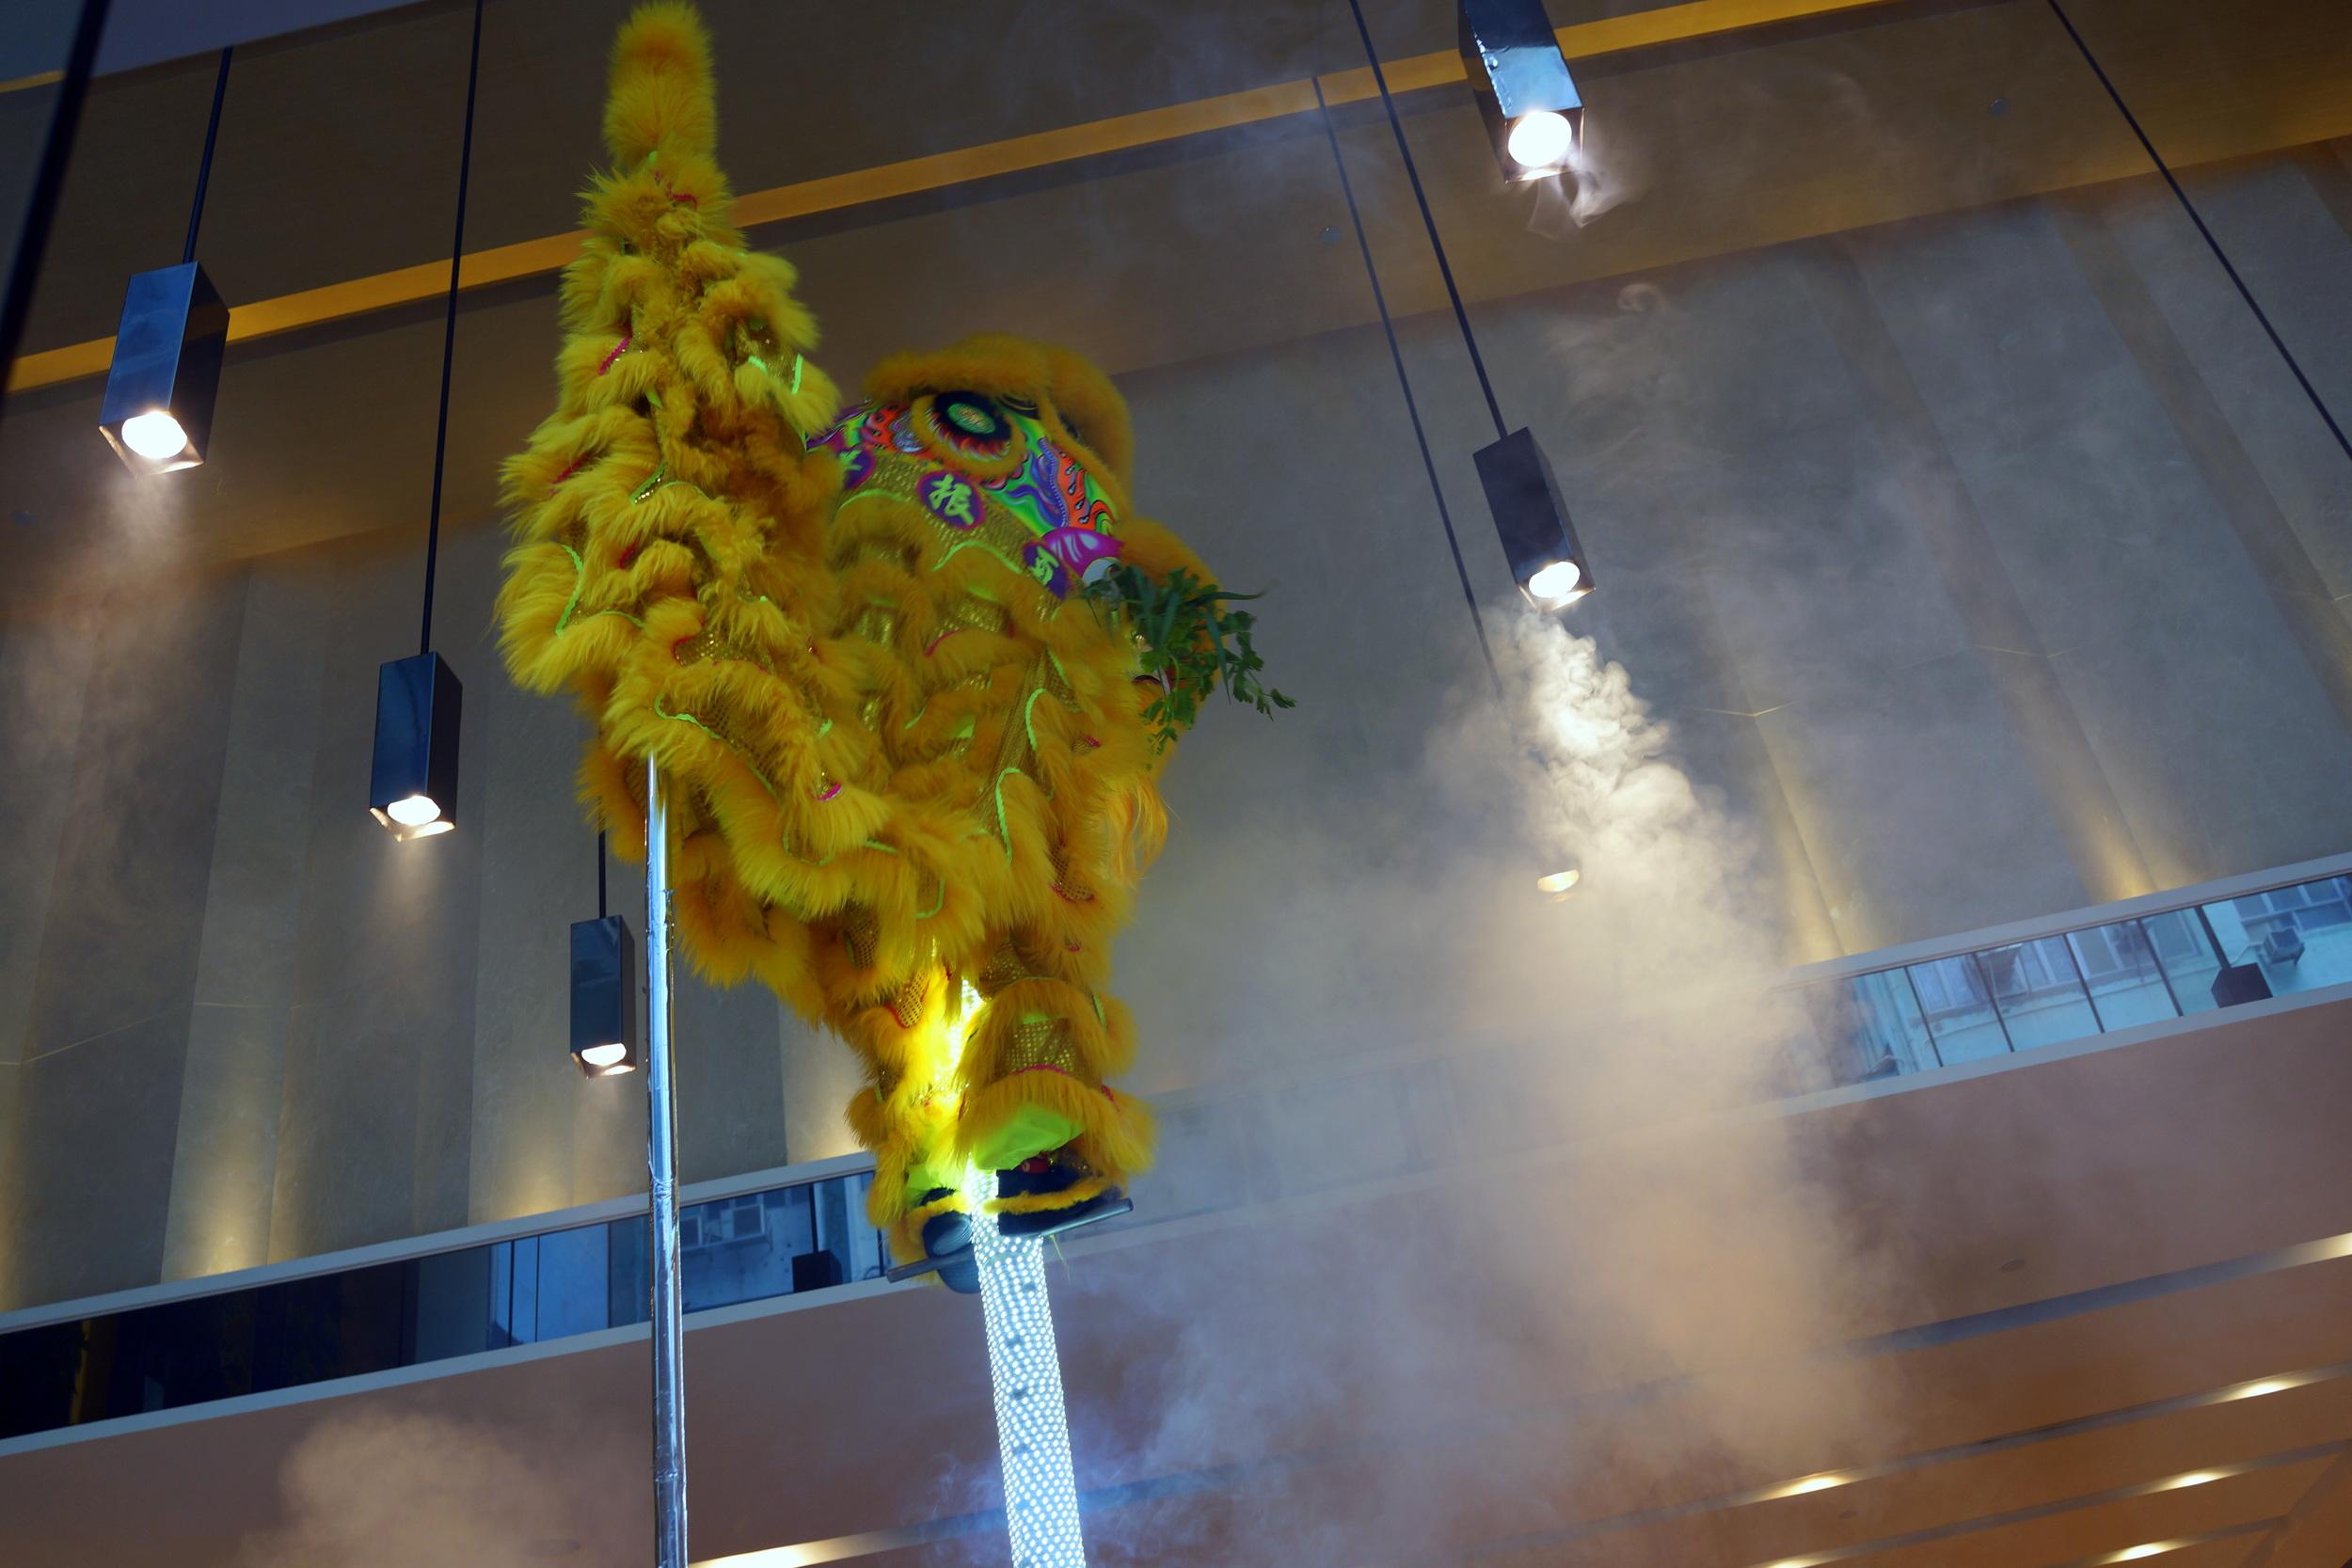 A traditional Hong Kong lion dance